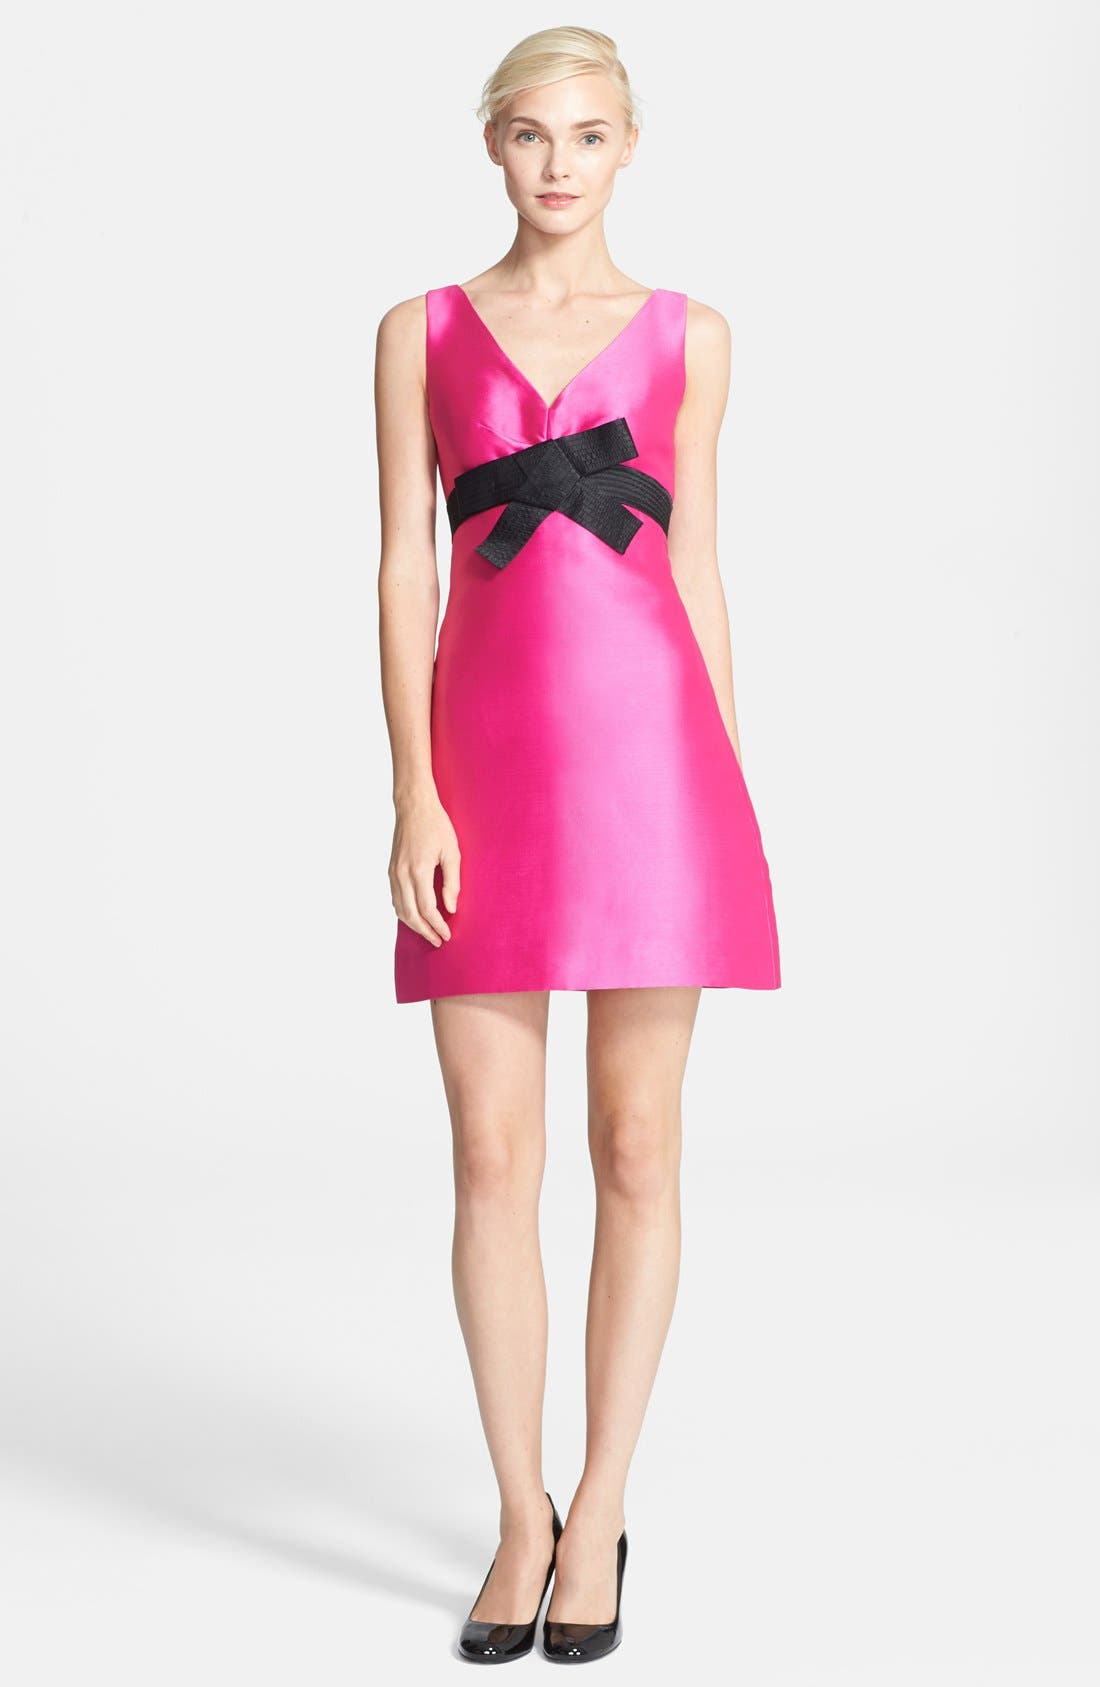 Main Image - kate spade new york 'origami' a-line dress